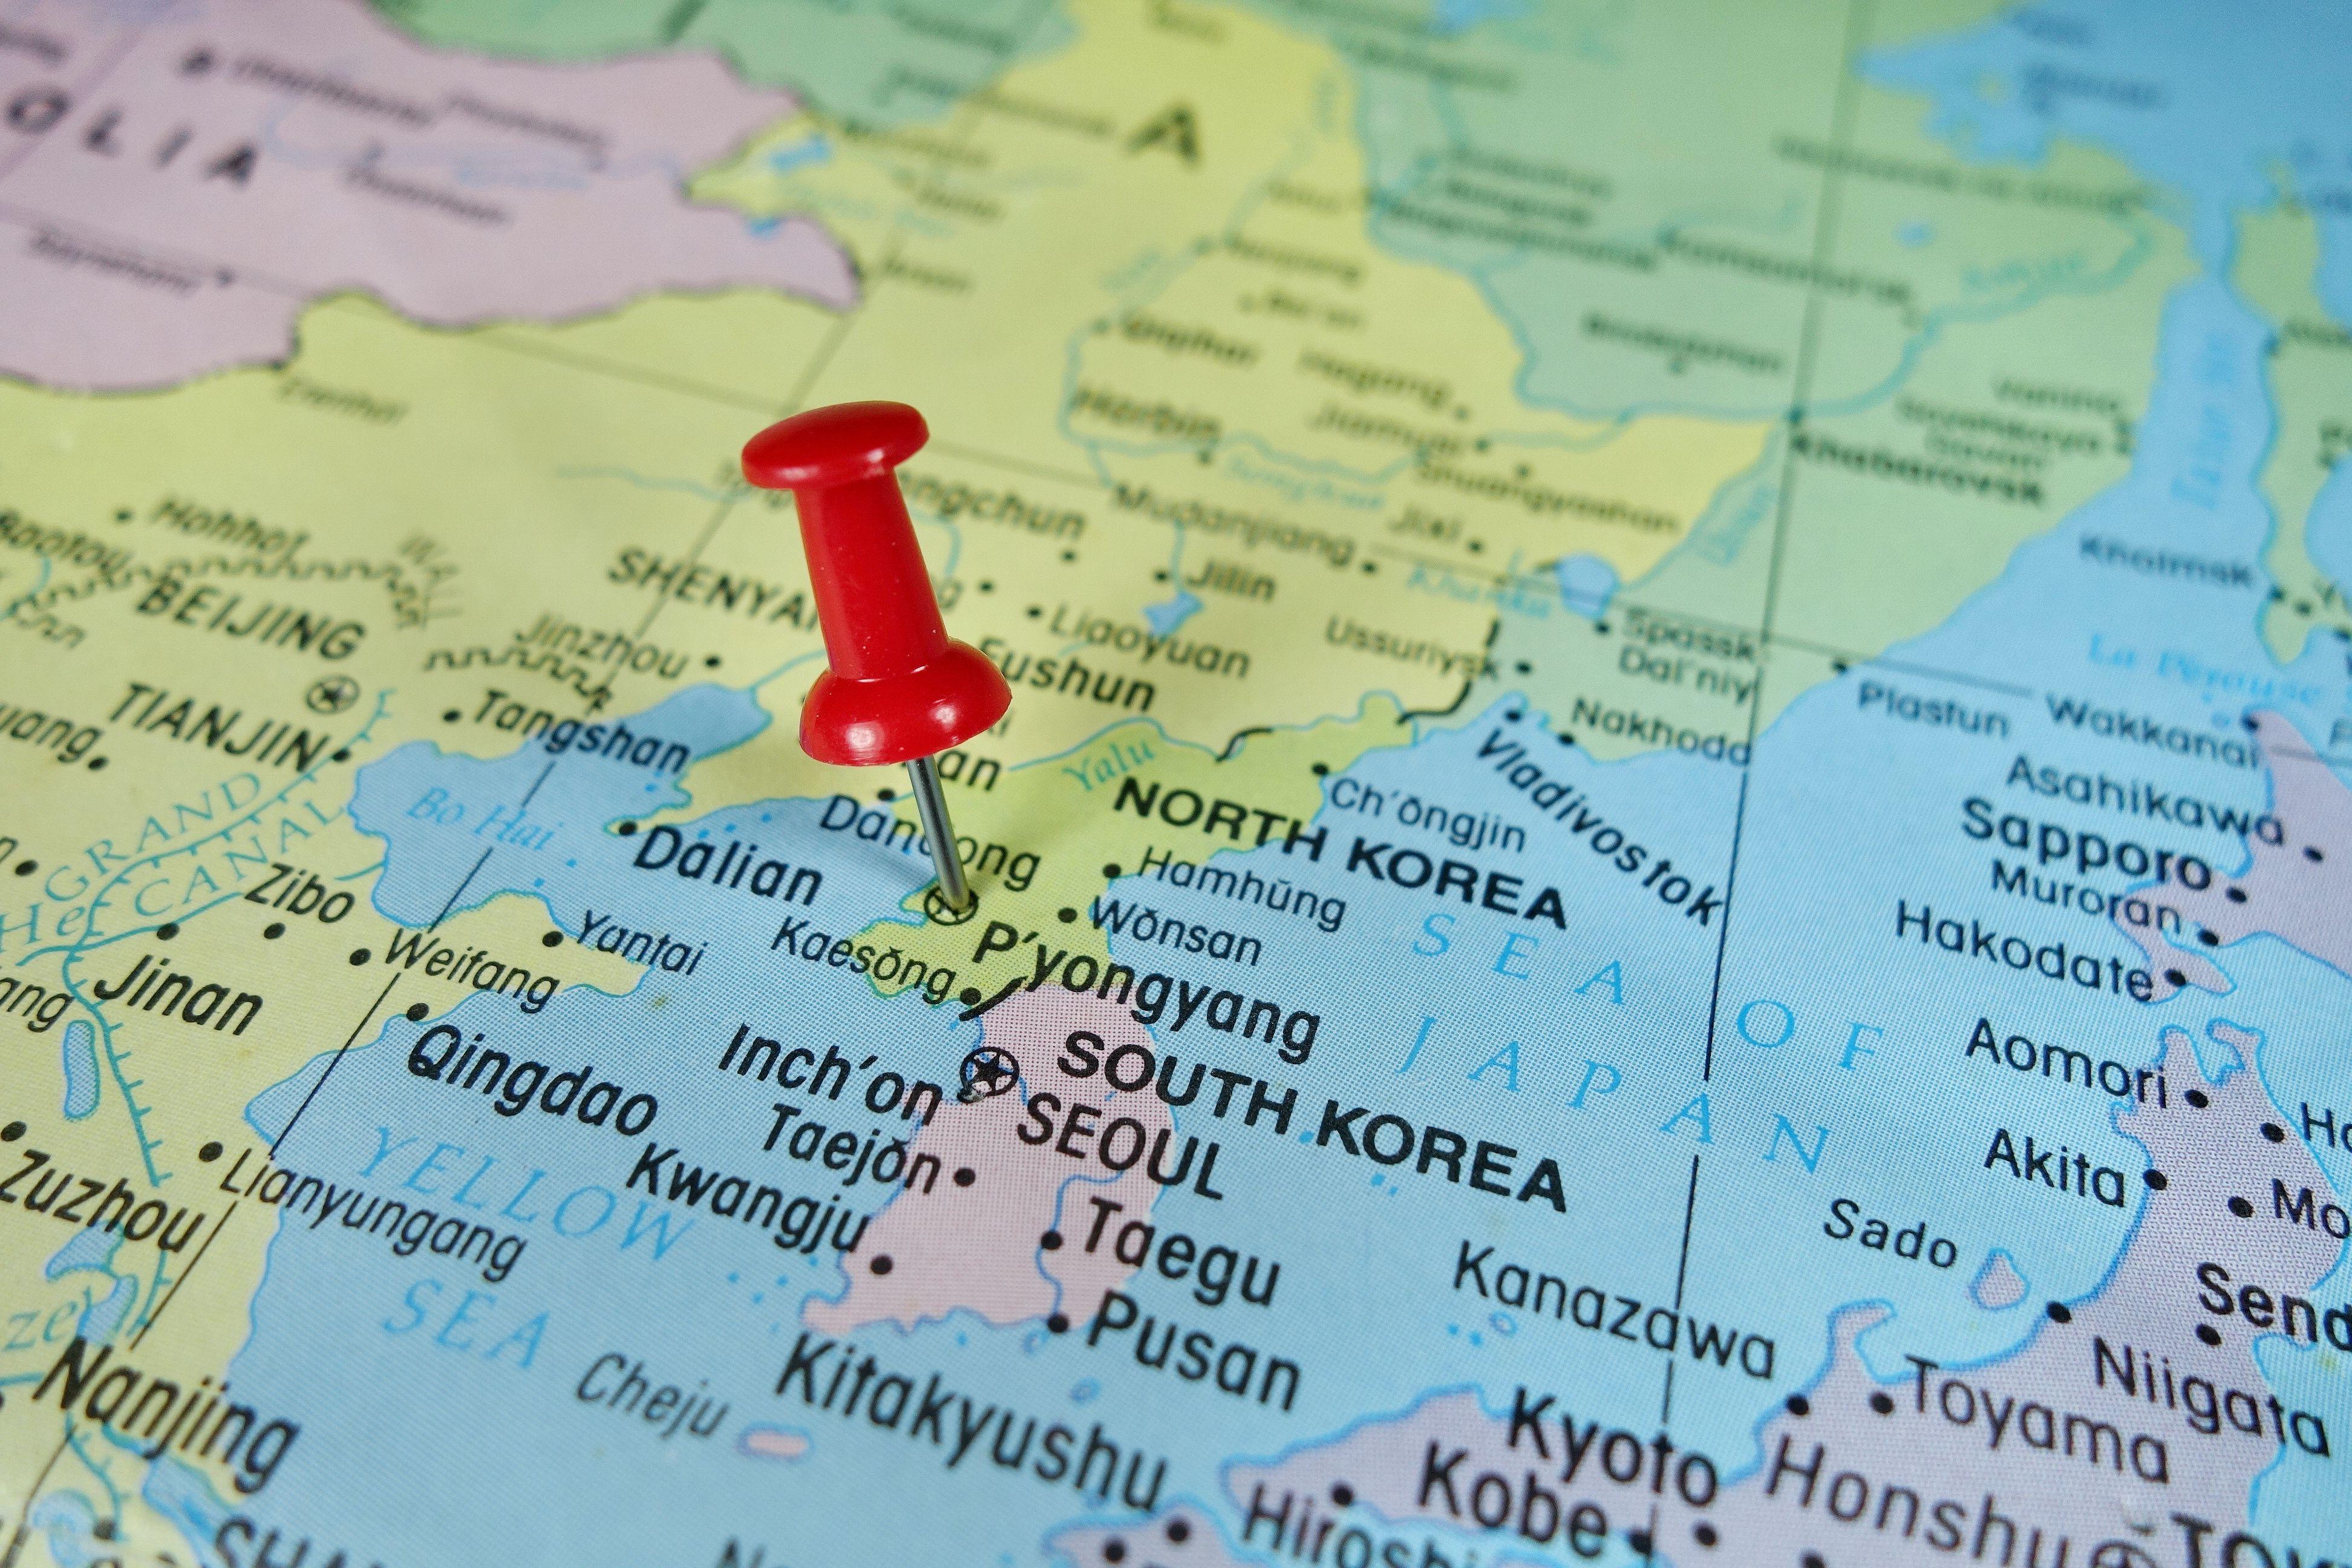 Geography Of The Korean Peninsula